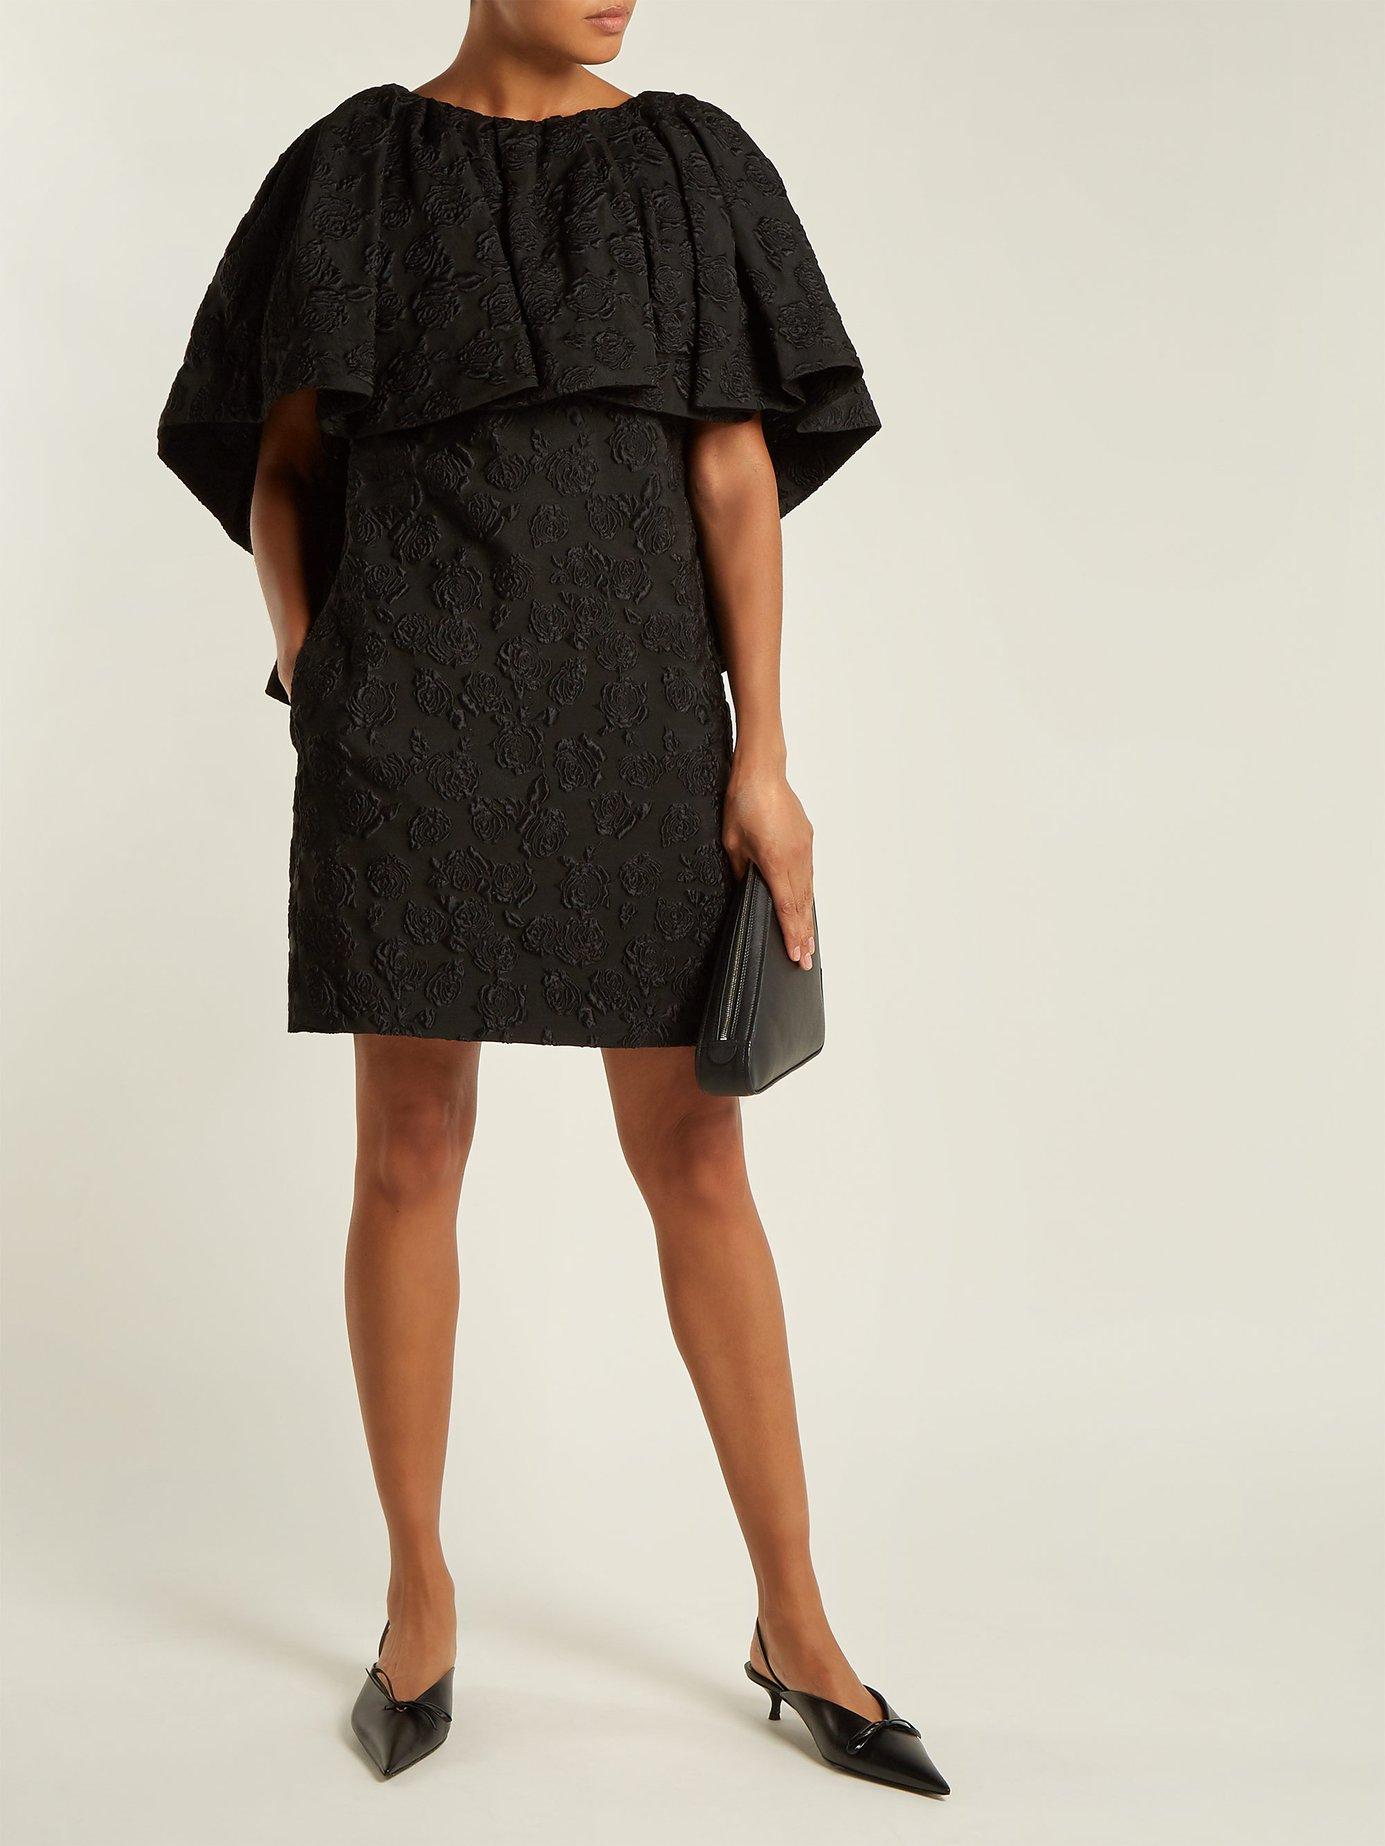 Floral-jacquard silk dress by Calvin Klein 205W39Nyc